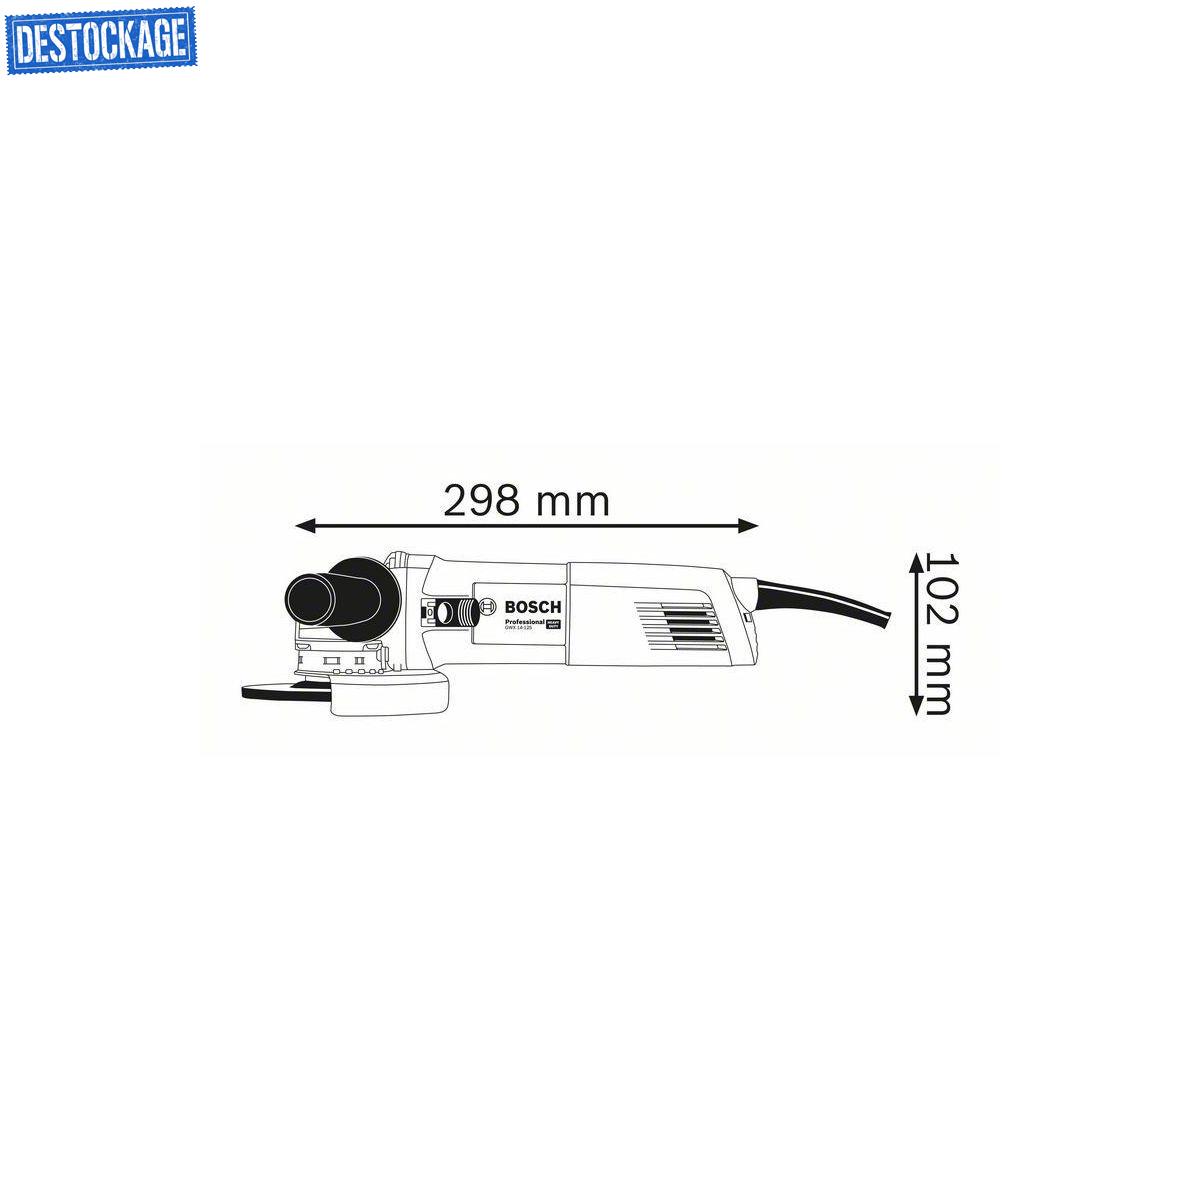 Bosch Professional Meuleuse Angulaire X-Lock GWX 14-125 1400 W, /Ø de meule : 125 mm, Bo/îte carton